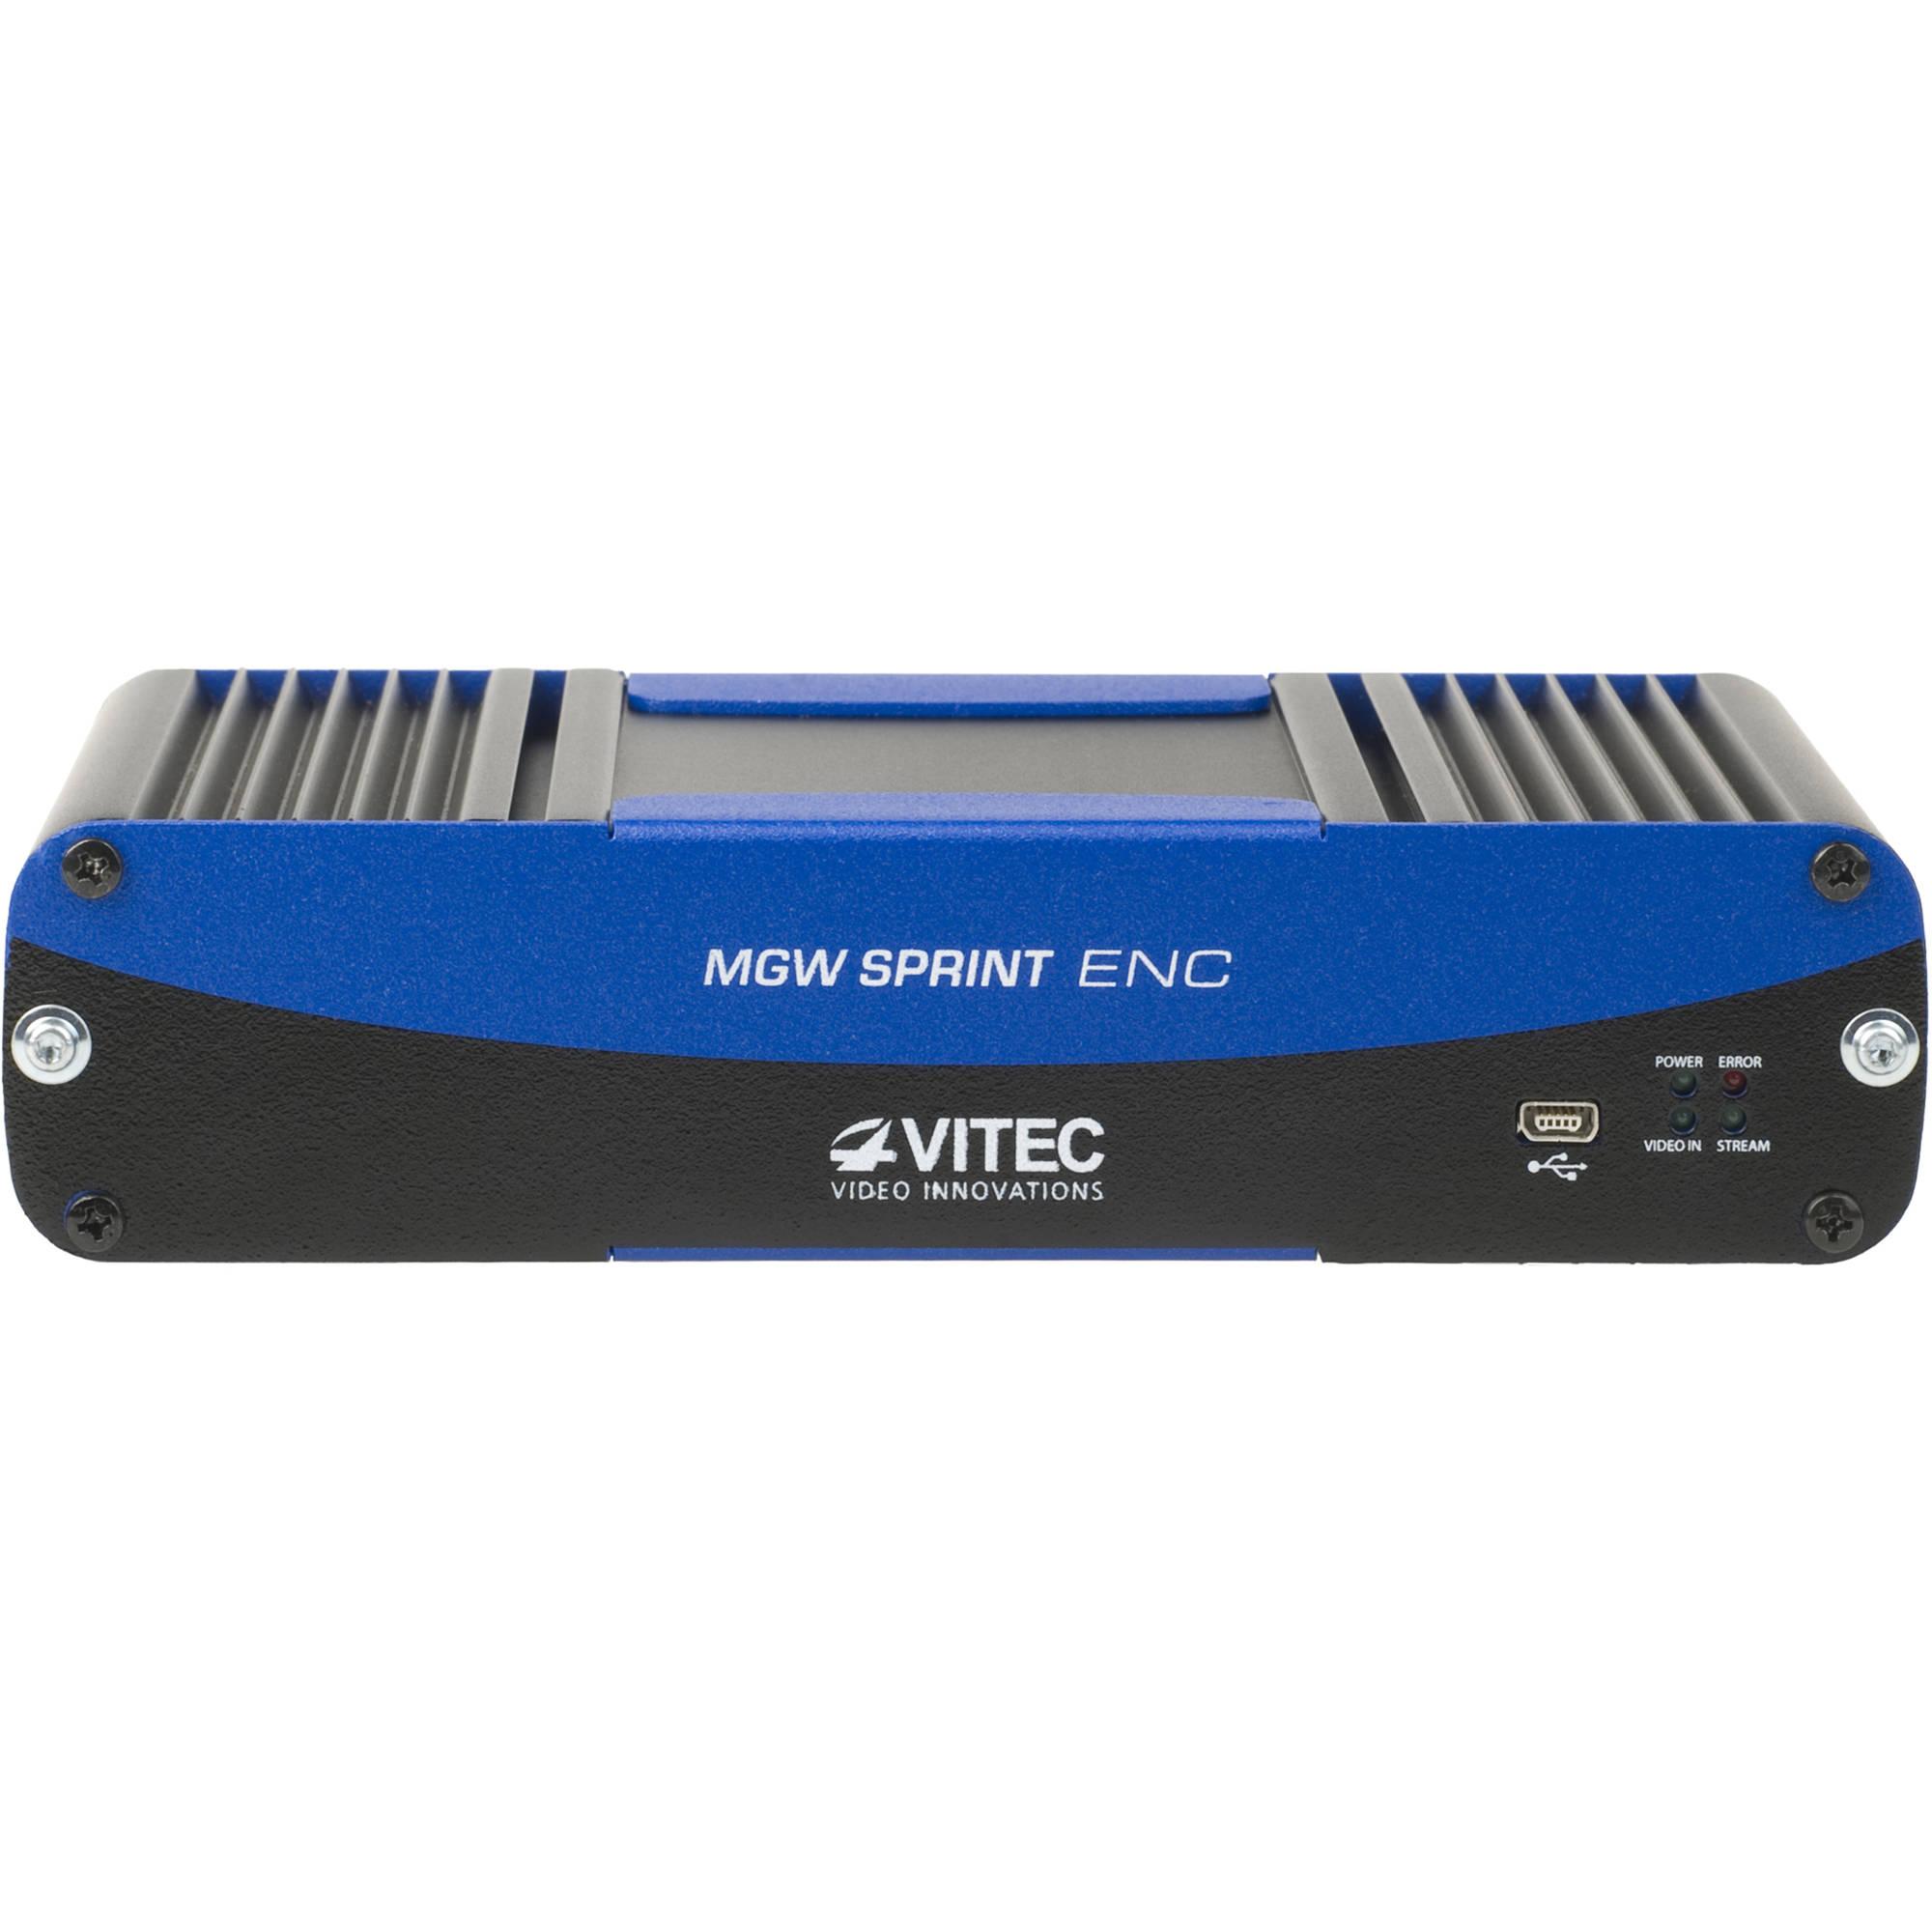 VITEC MGW Sprint Sub One-Frame H 264 HD IPTV Decoder